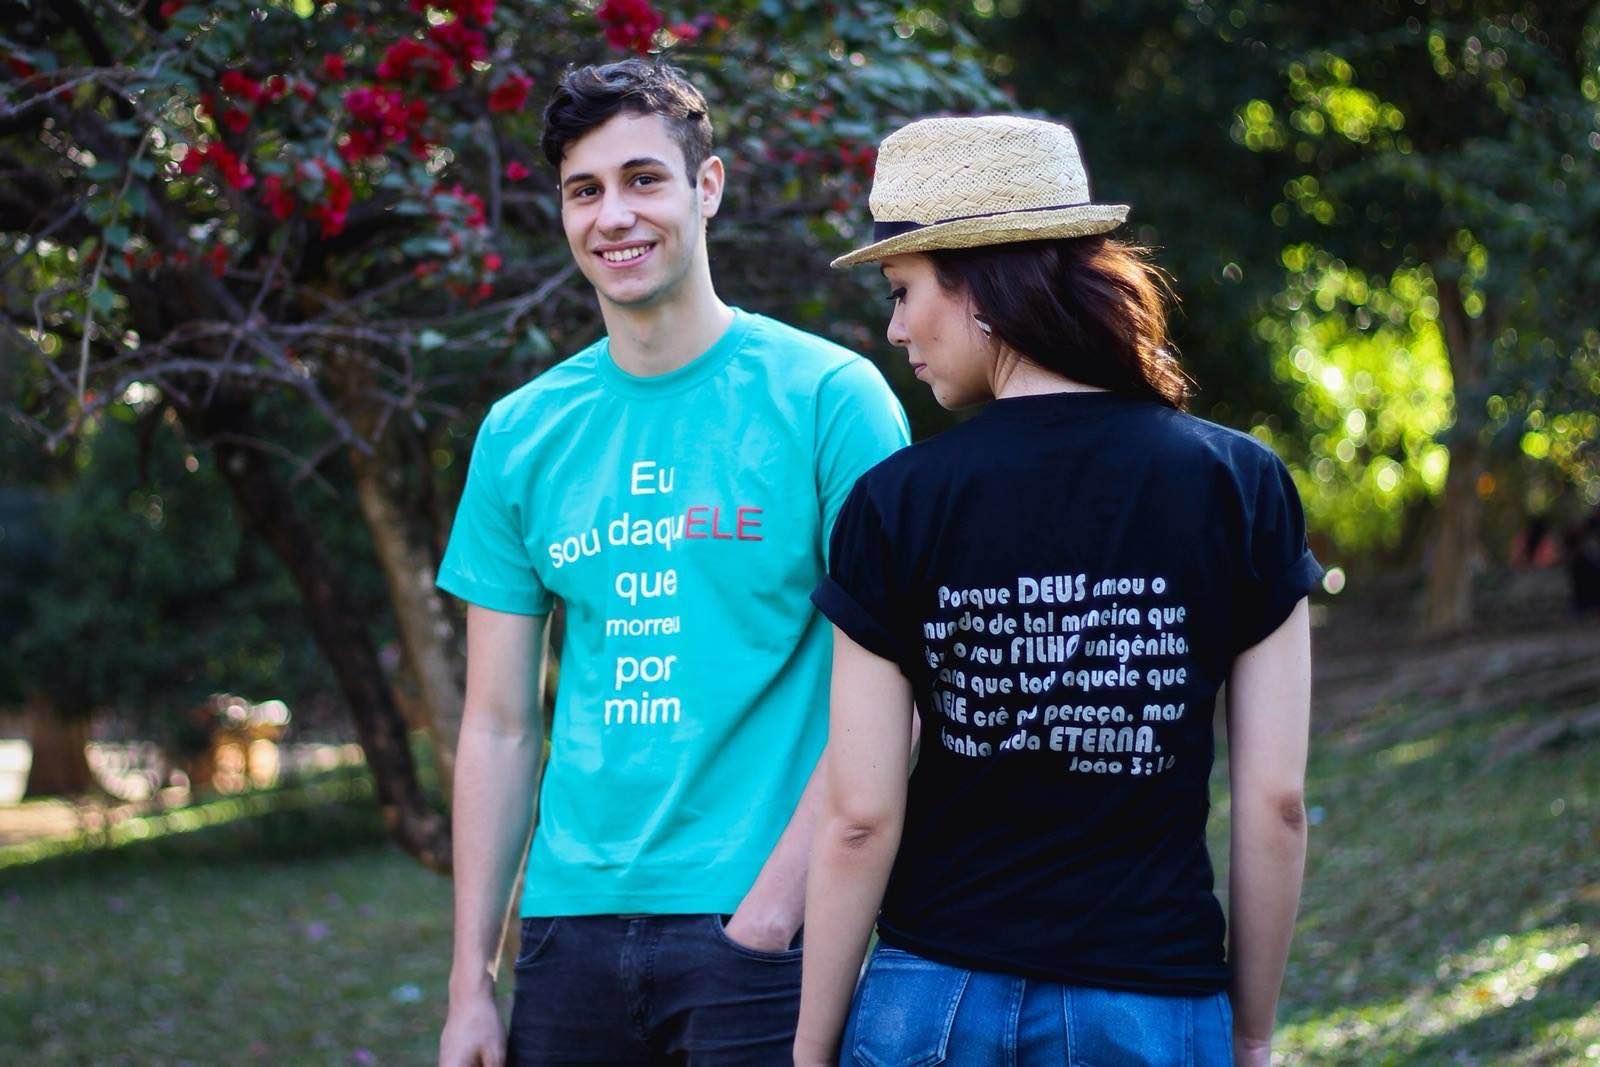 moda evangélica, moda masculina, camiseta evangelica, estampa cristã, moda cristã, menswear, moda sem censura, alex cursino, blog de moda, 4